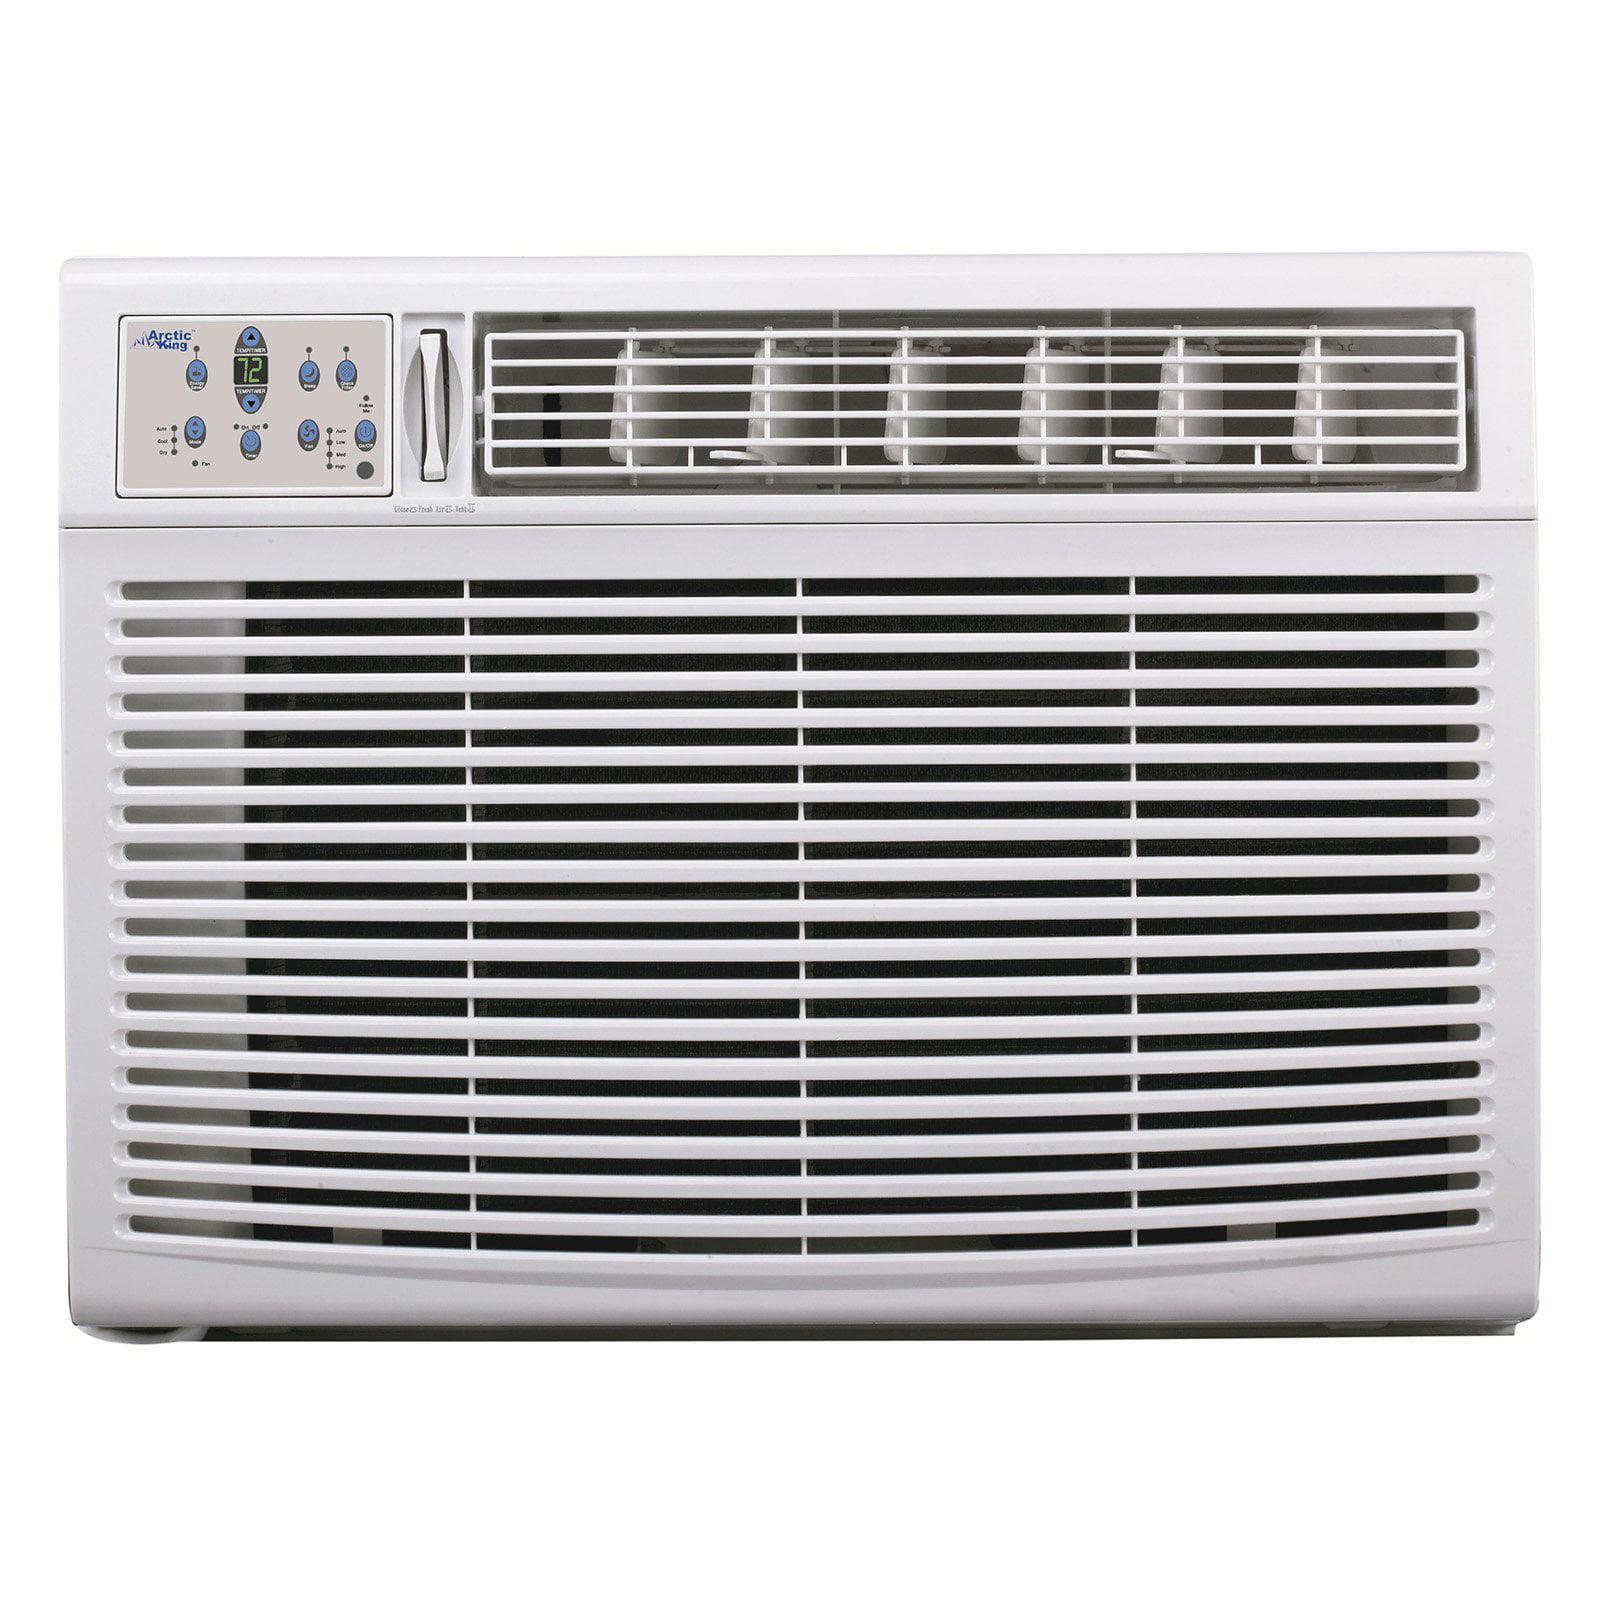 Arctic King 25K 208V Window Air Conditioner